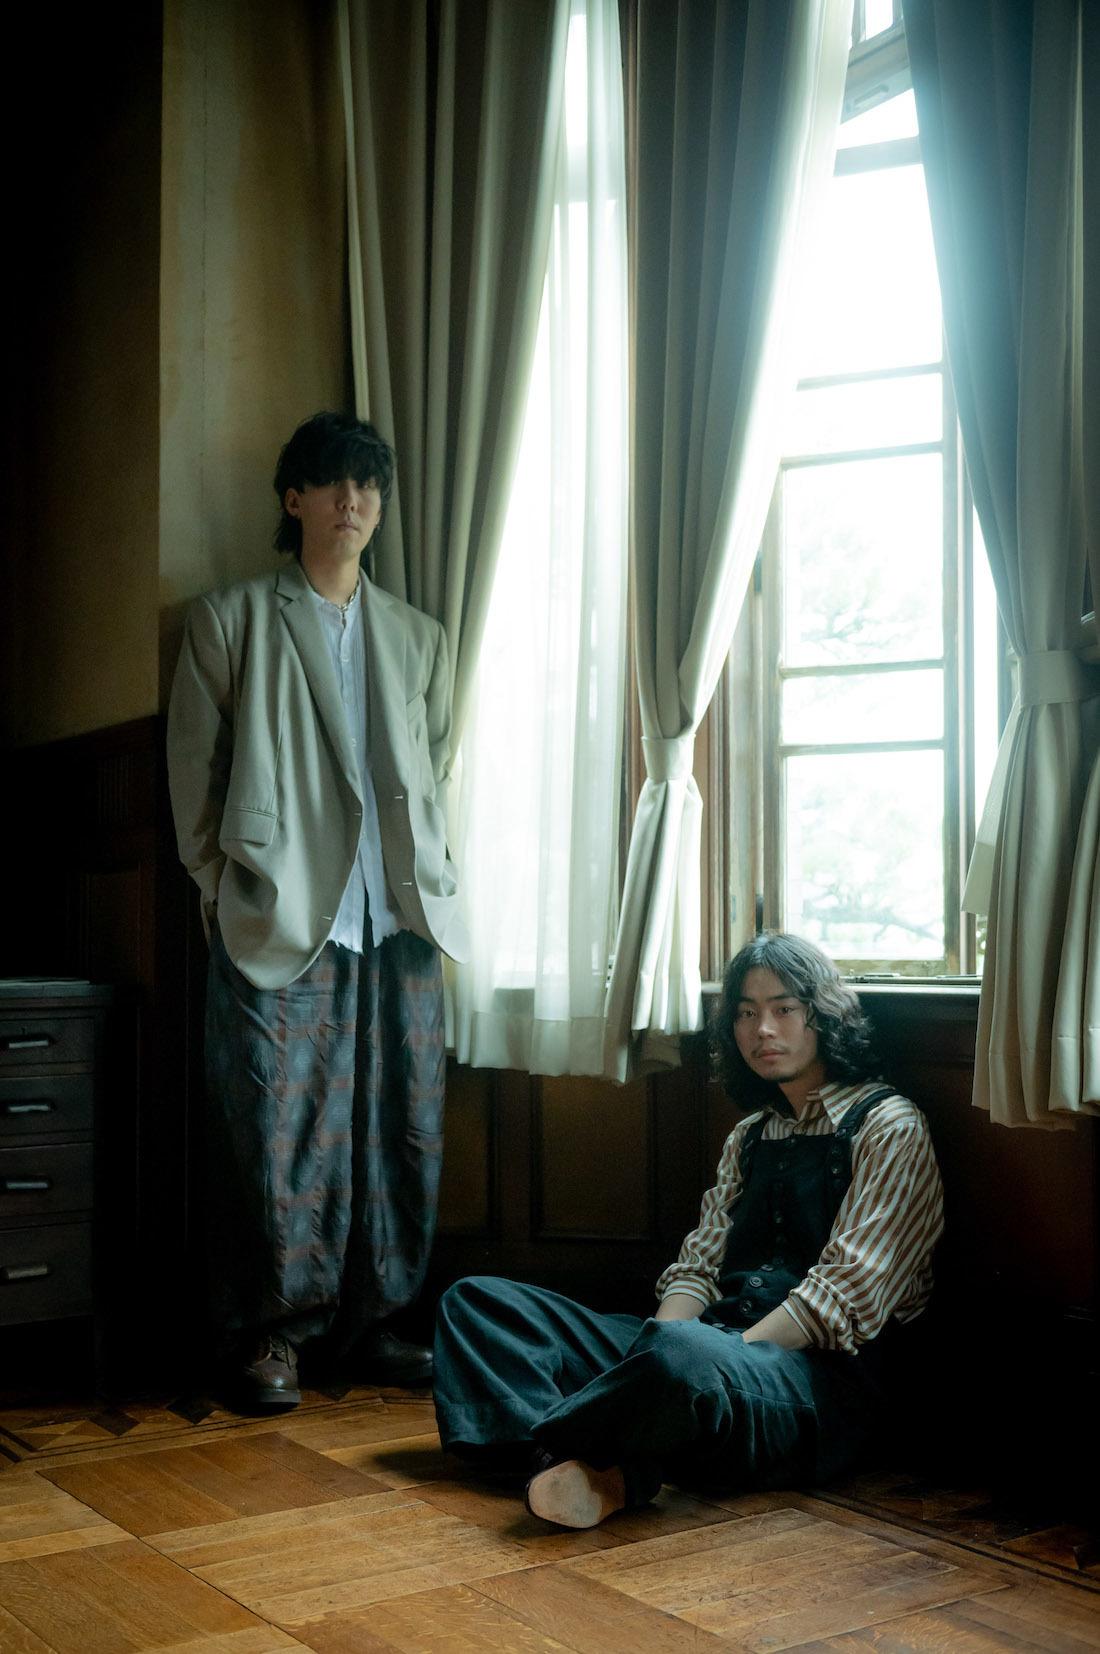 野田洋次郎、菅田将暉 Photo by Takeshi Yao